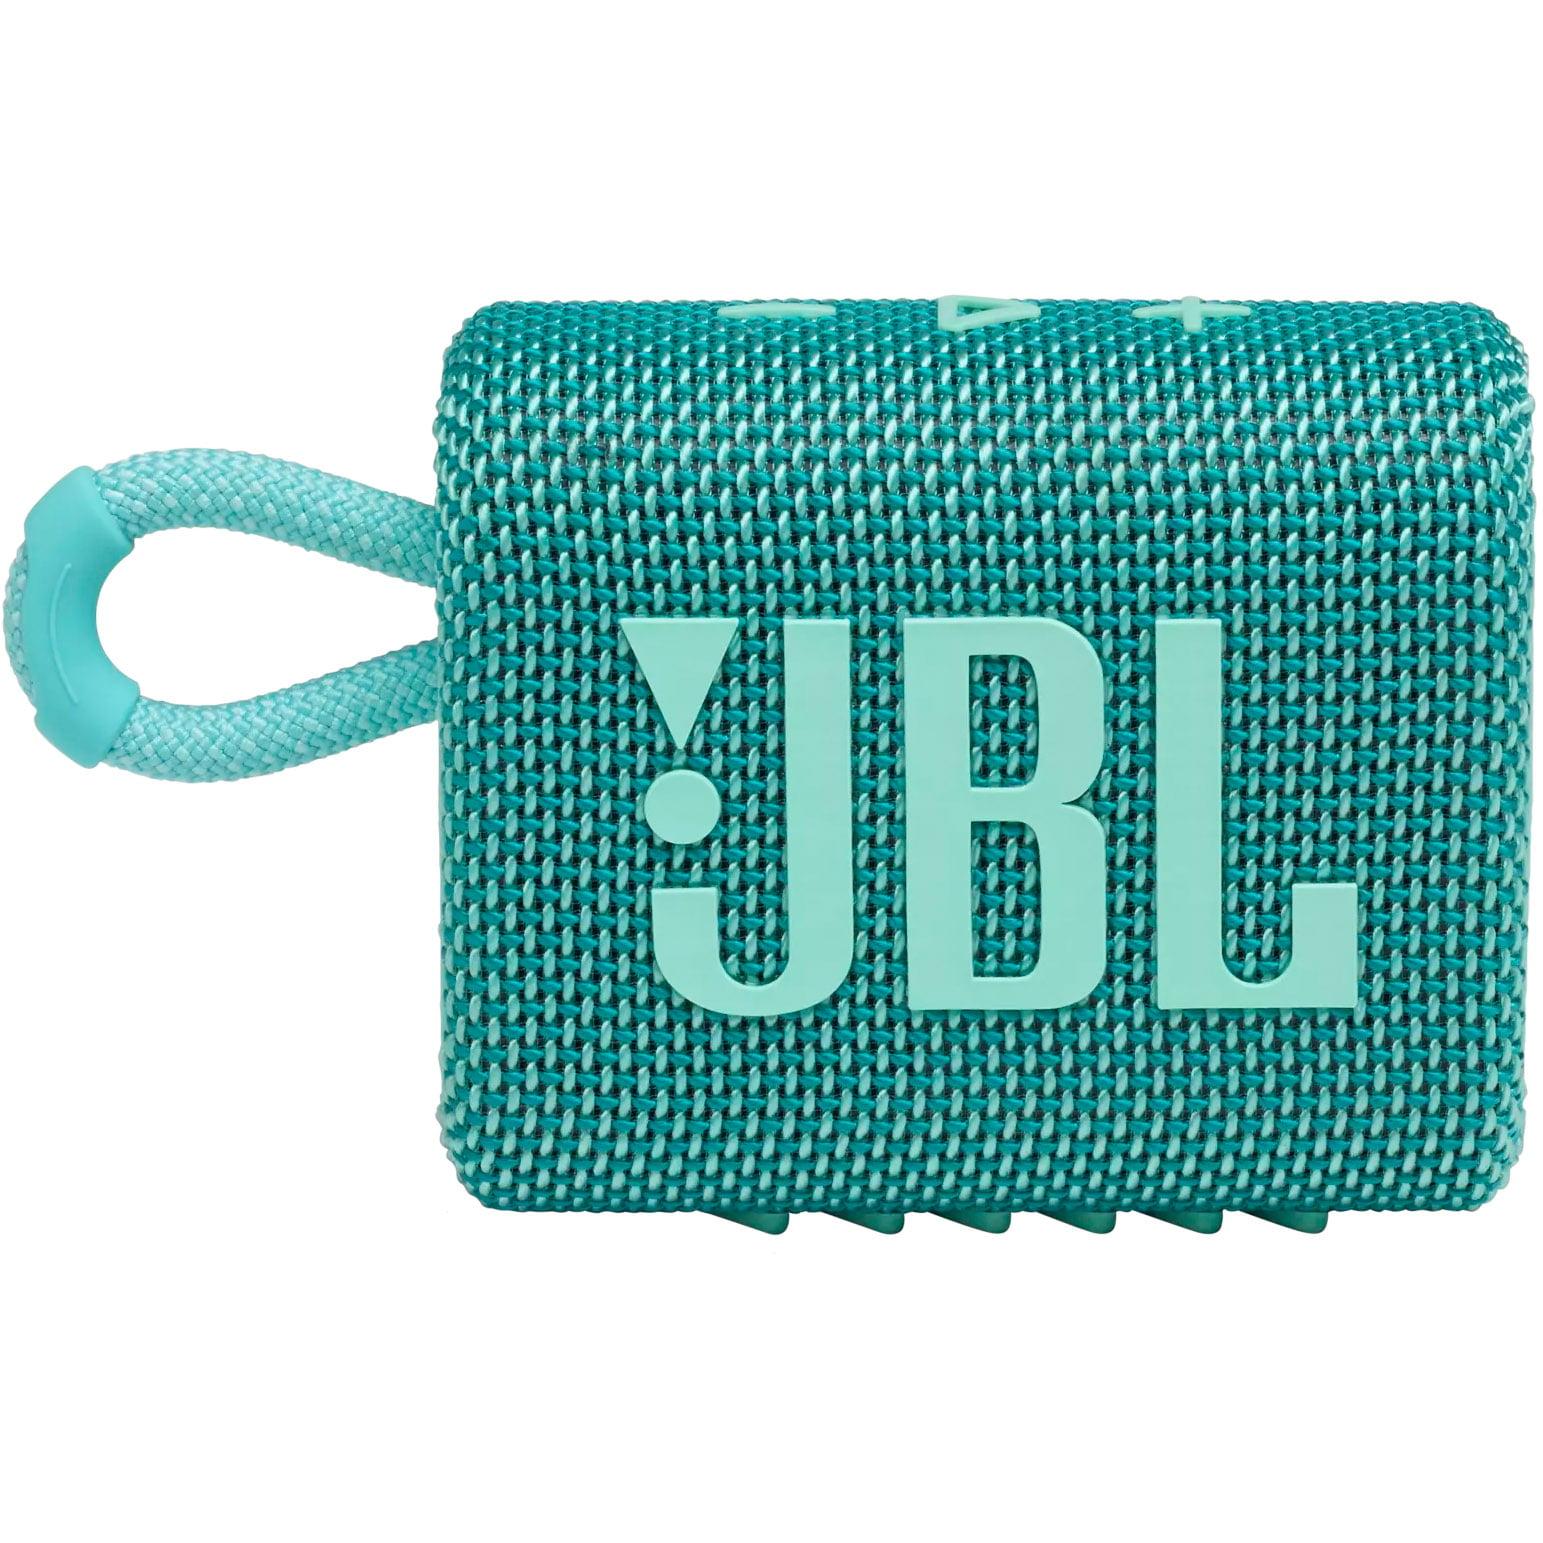 Boxa portabila JBL GO 3, Wireless, Bluetooth, IPX7 Waterproof, Teal